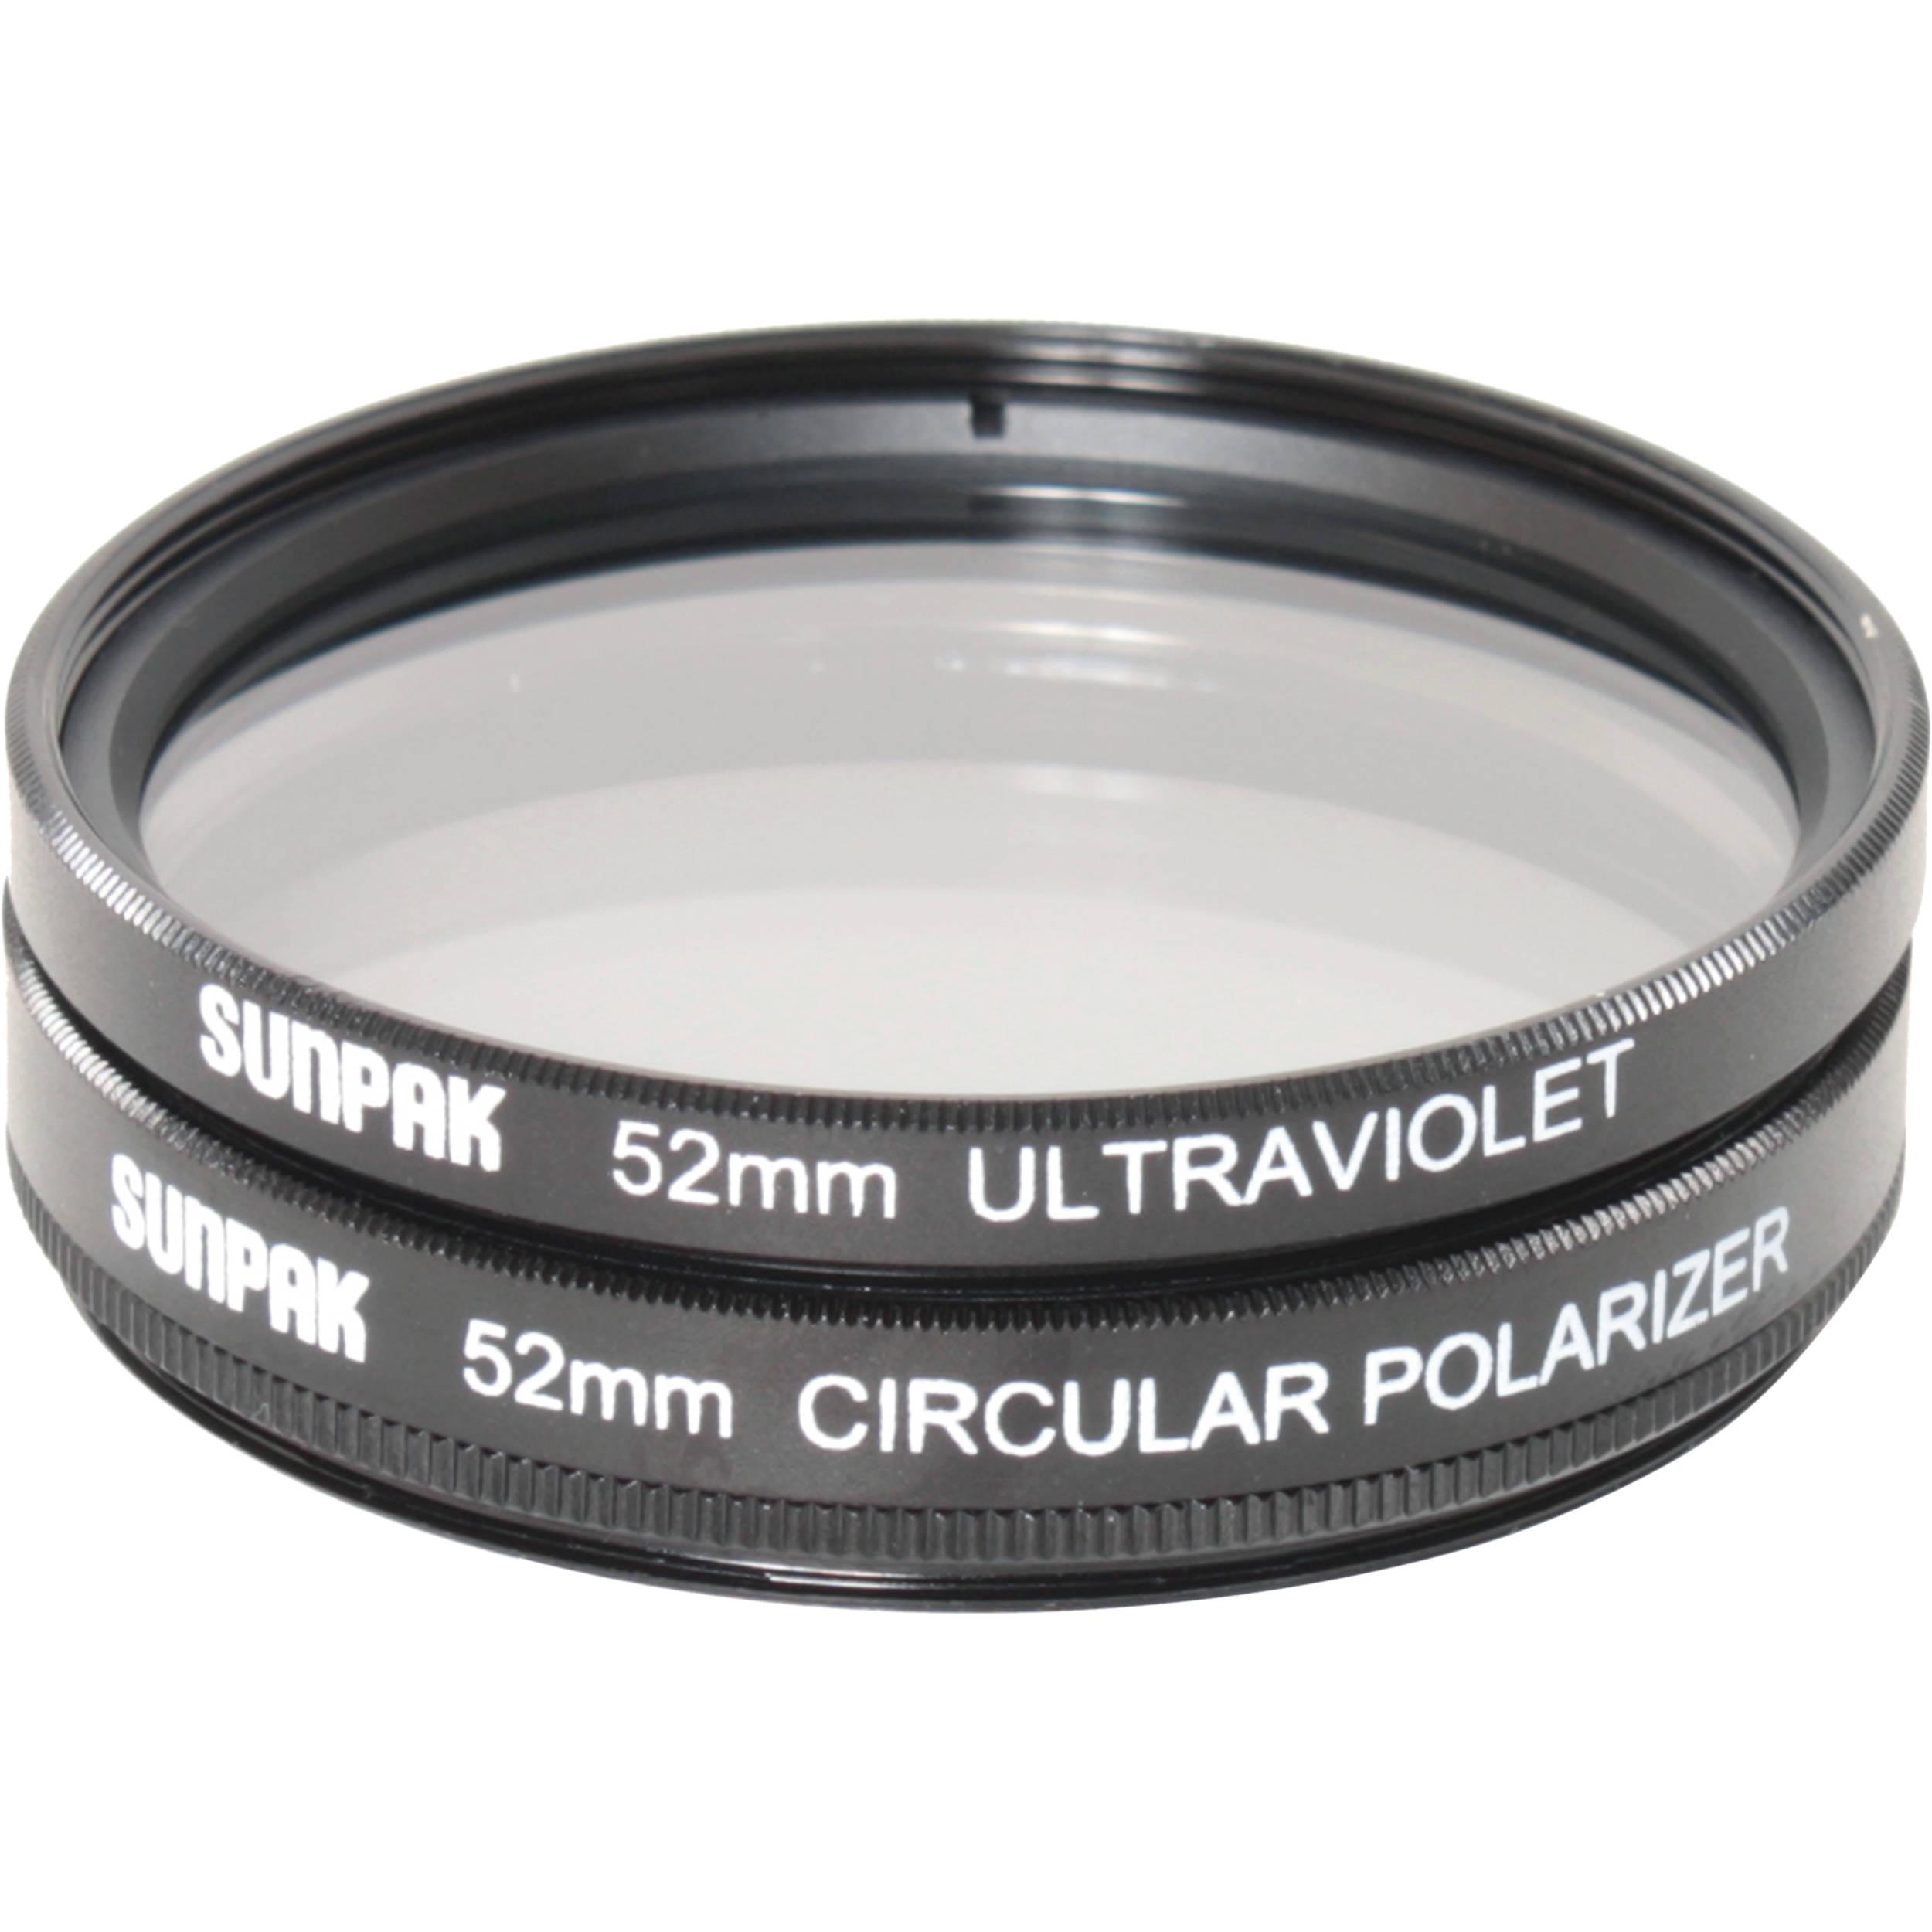 Sunpak Circular 52mm Polarized Filter